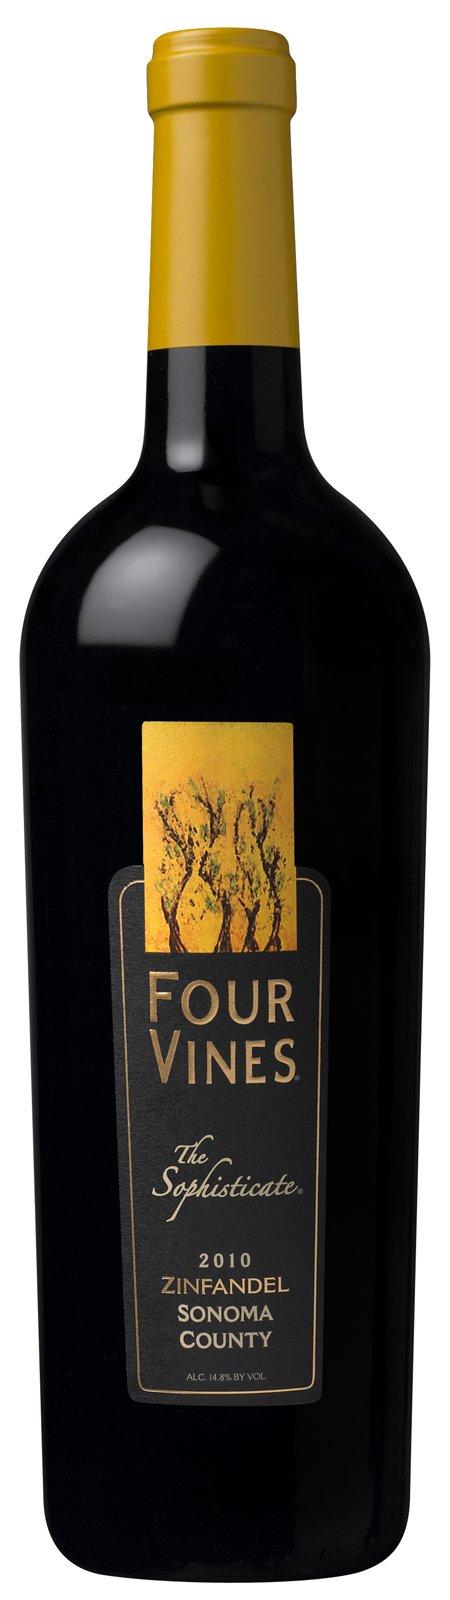 "2010 Four Vines Zinfandel ""The Sophisticate"" Sonoma County"